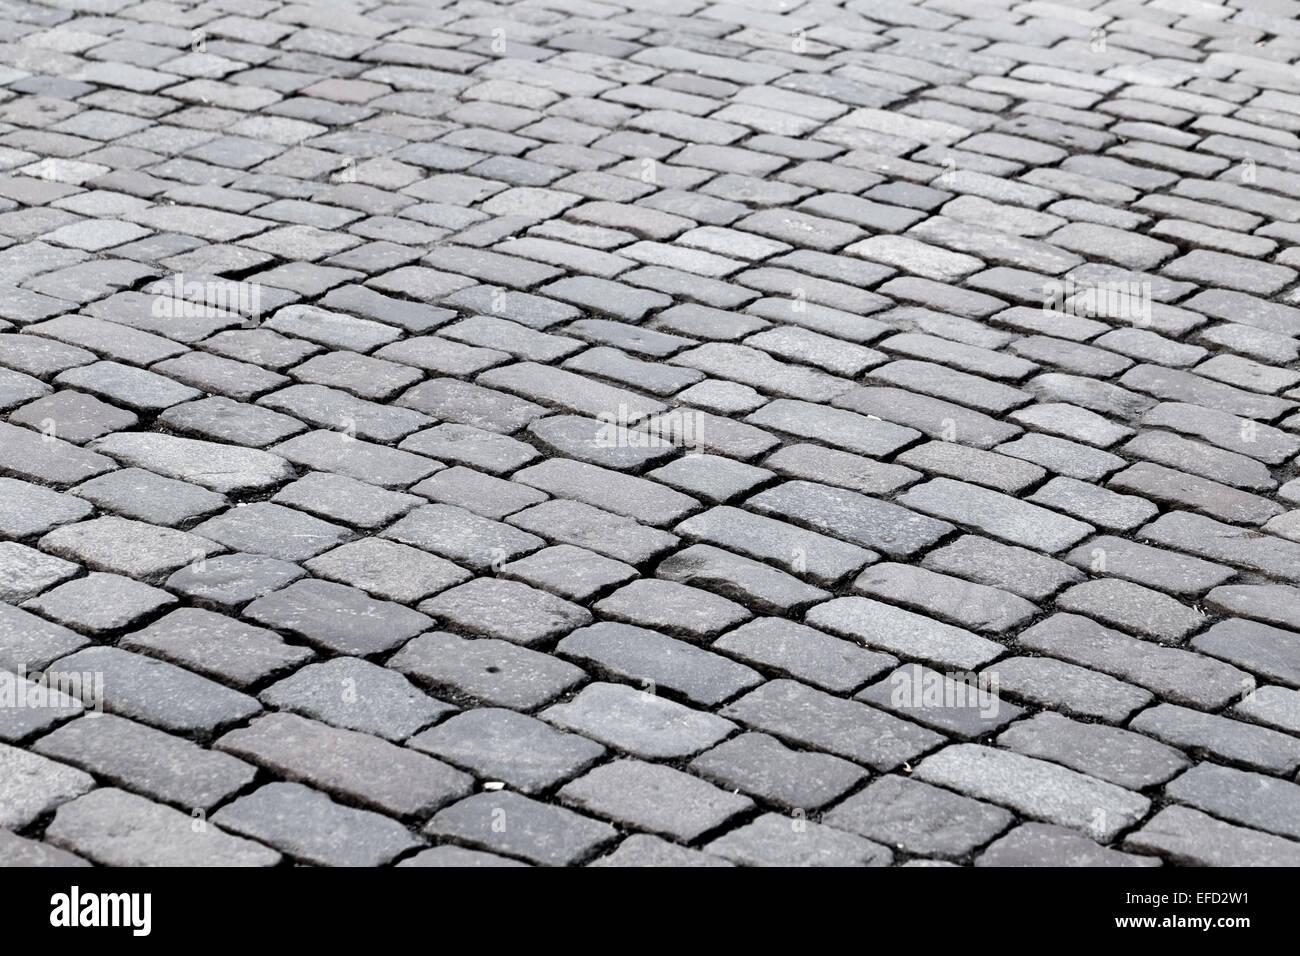 patterned paving tiles of olf sreet square - Stock Image